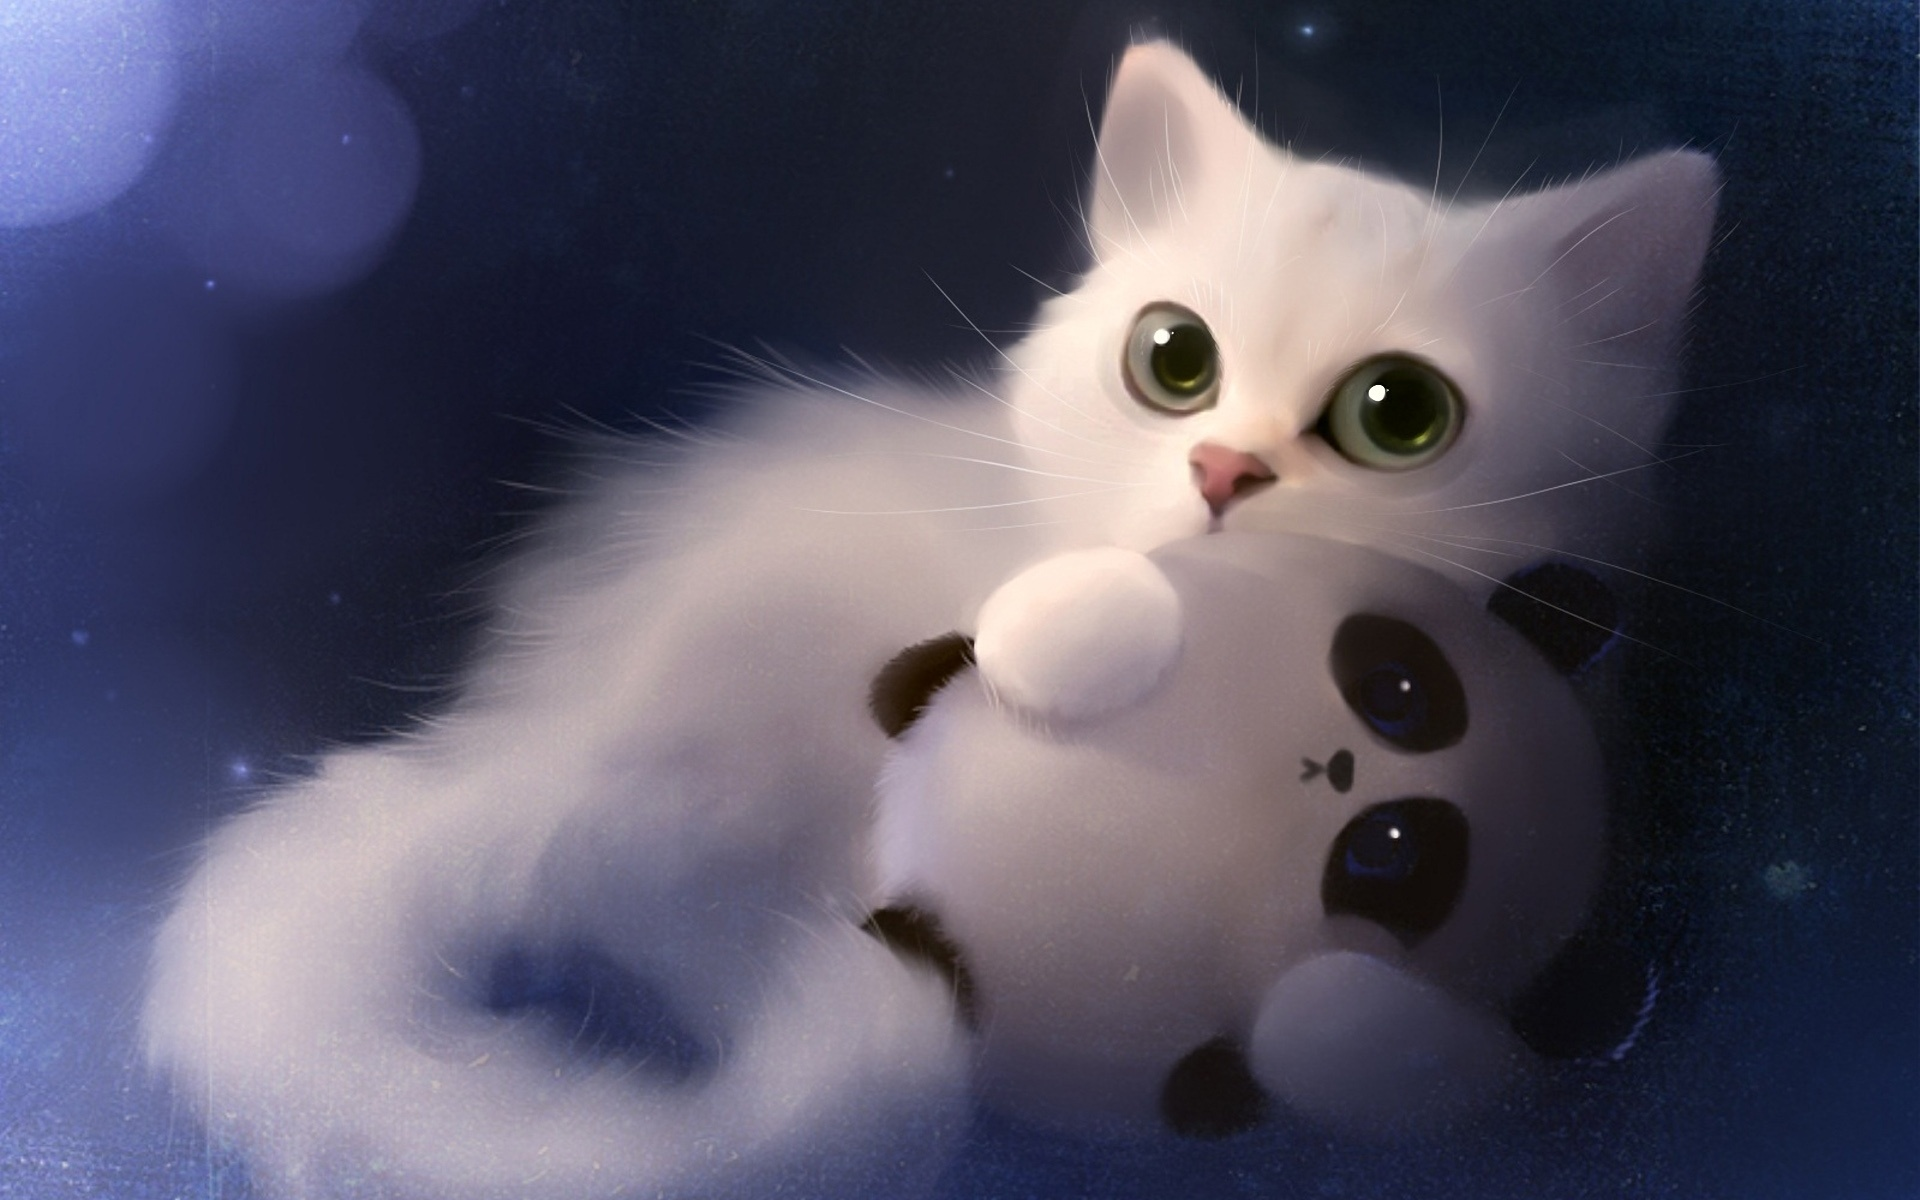 Wallpaper Art Painting White Cat And Toy Panda 1920x1200 Hd